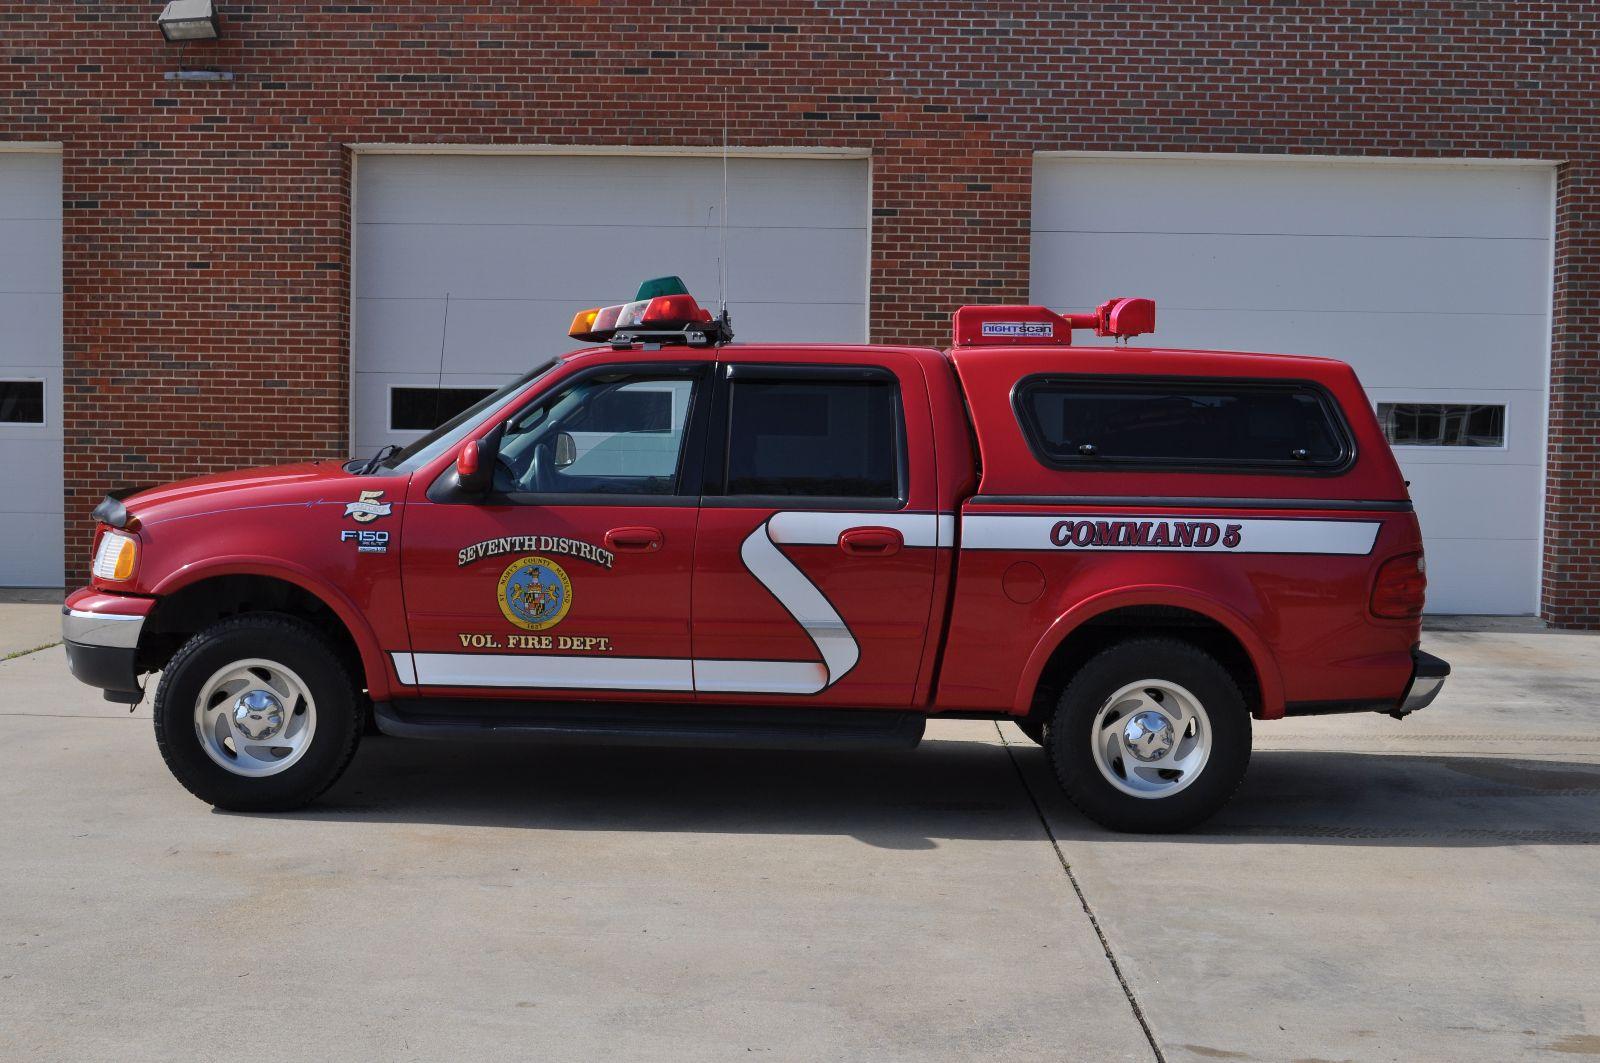 Seventh District Volunteer Fire Department